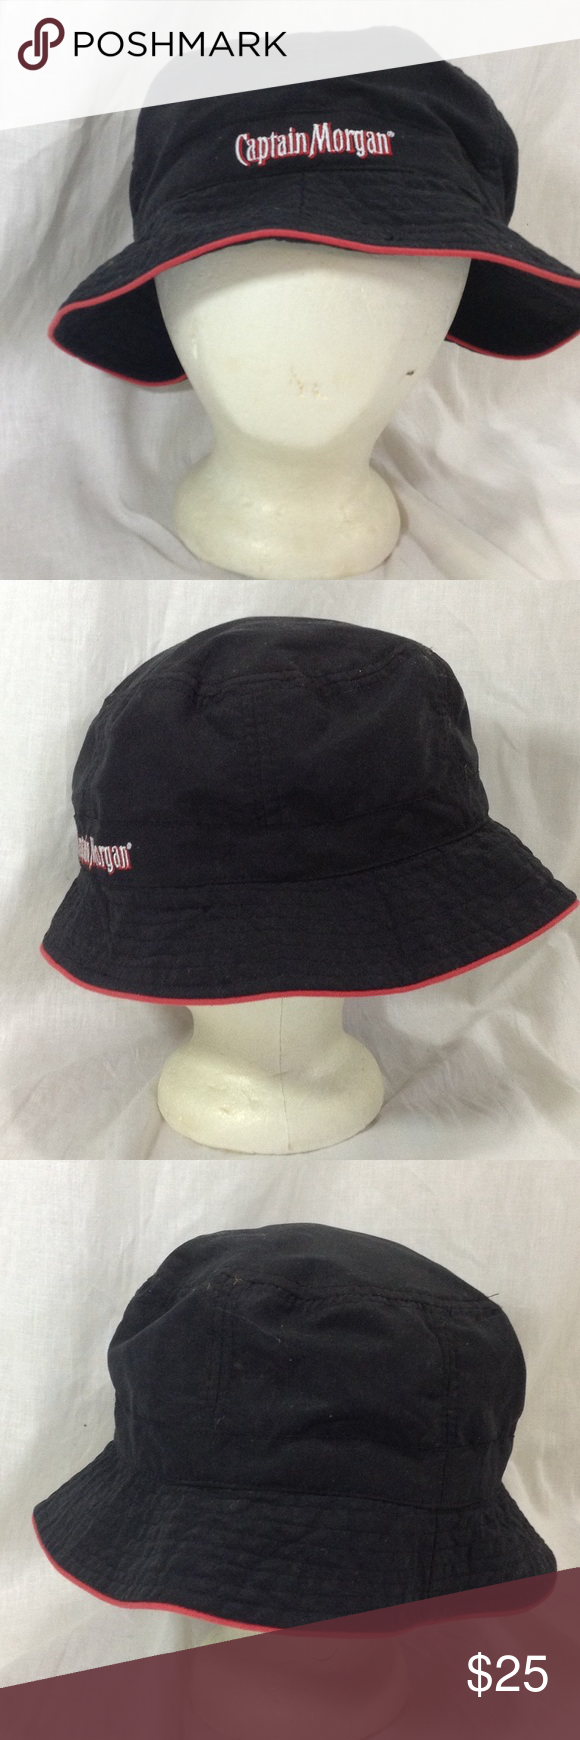 Captain Morgan Bucket Hat Fishing Cap Bucket Hat Captain Morgan Clothes Design